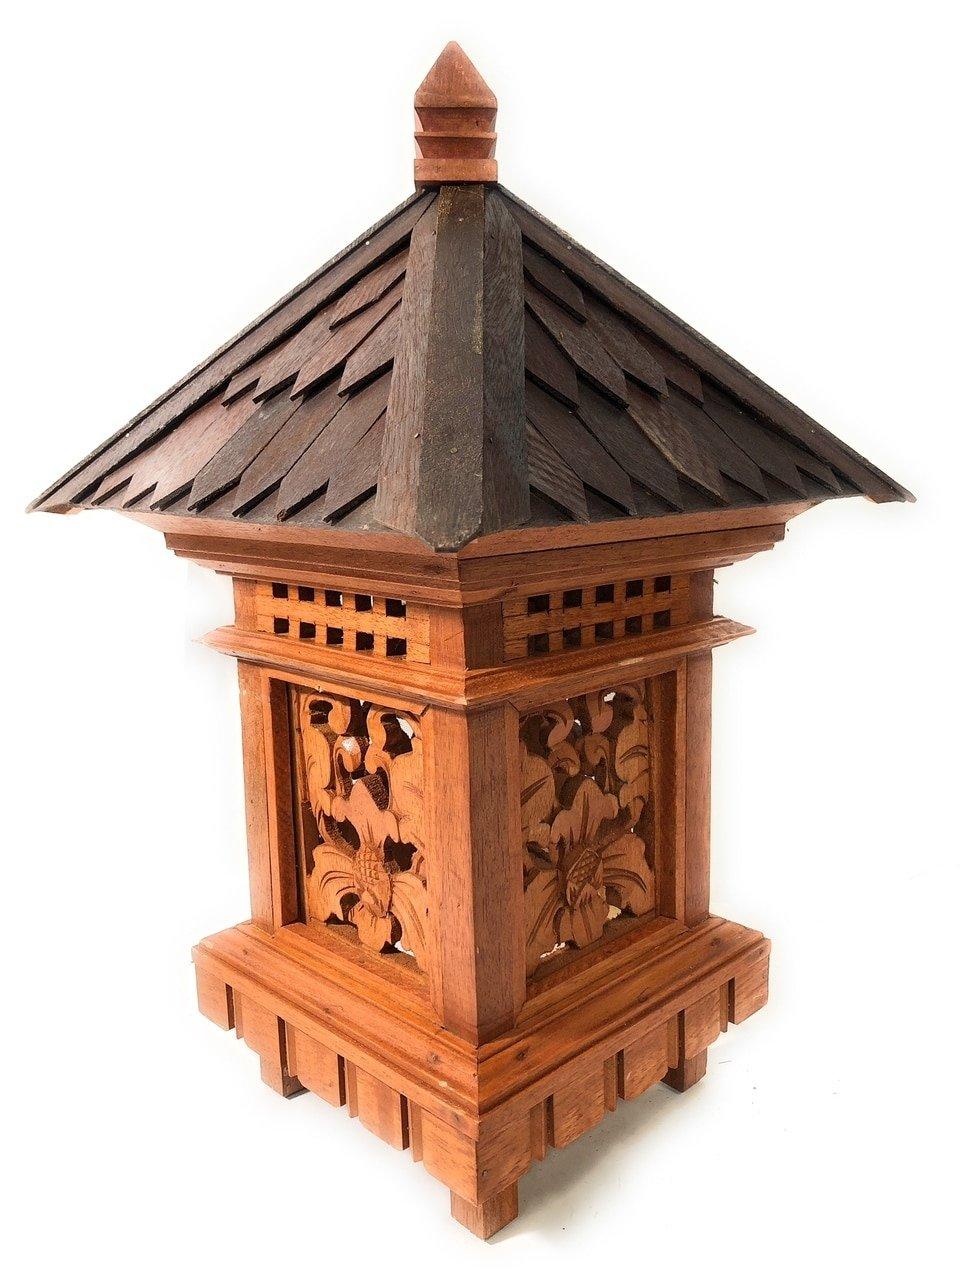 Tikimaster Balinese Lantern 24'' w/Shingle Roof & Carvings | #pdy2700320